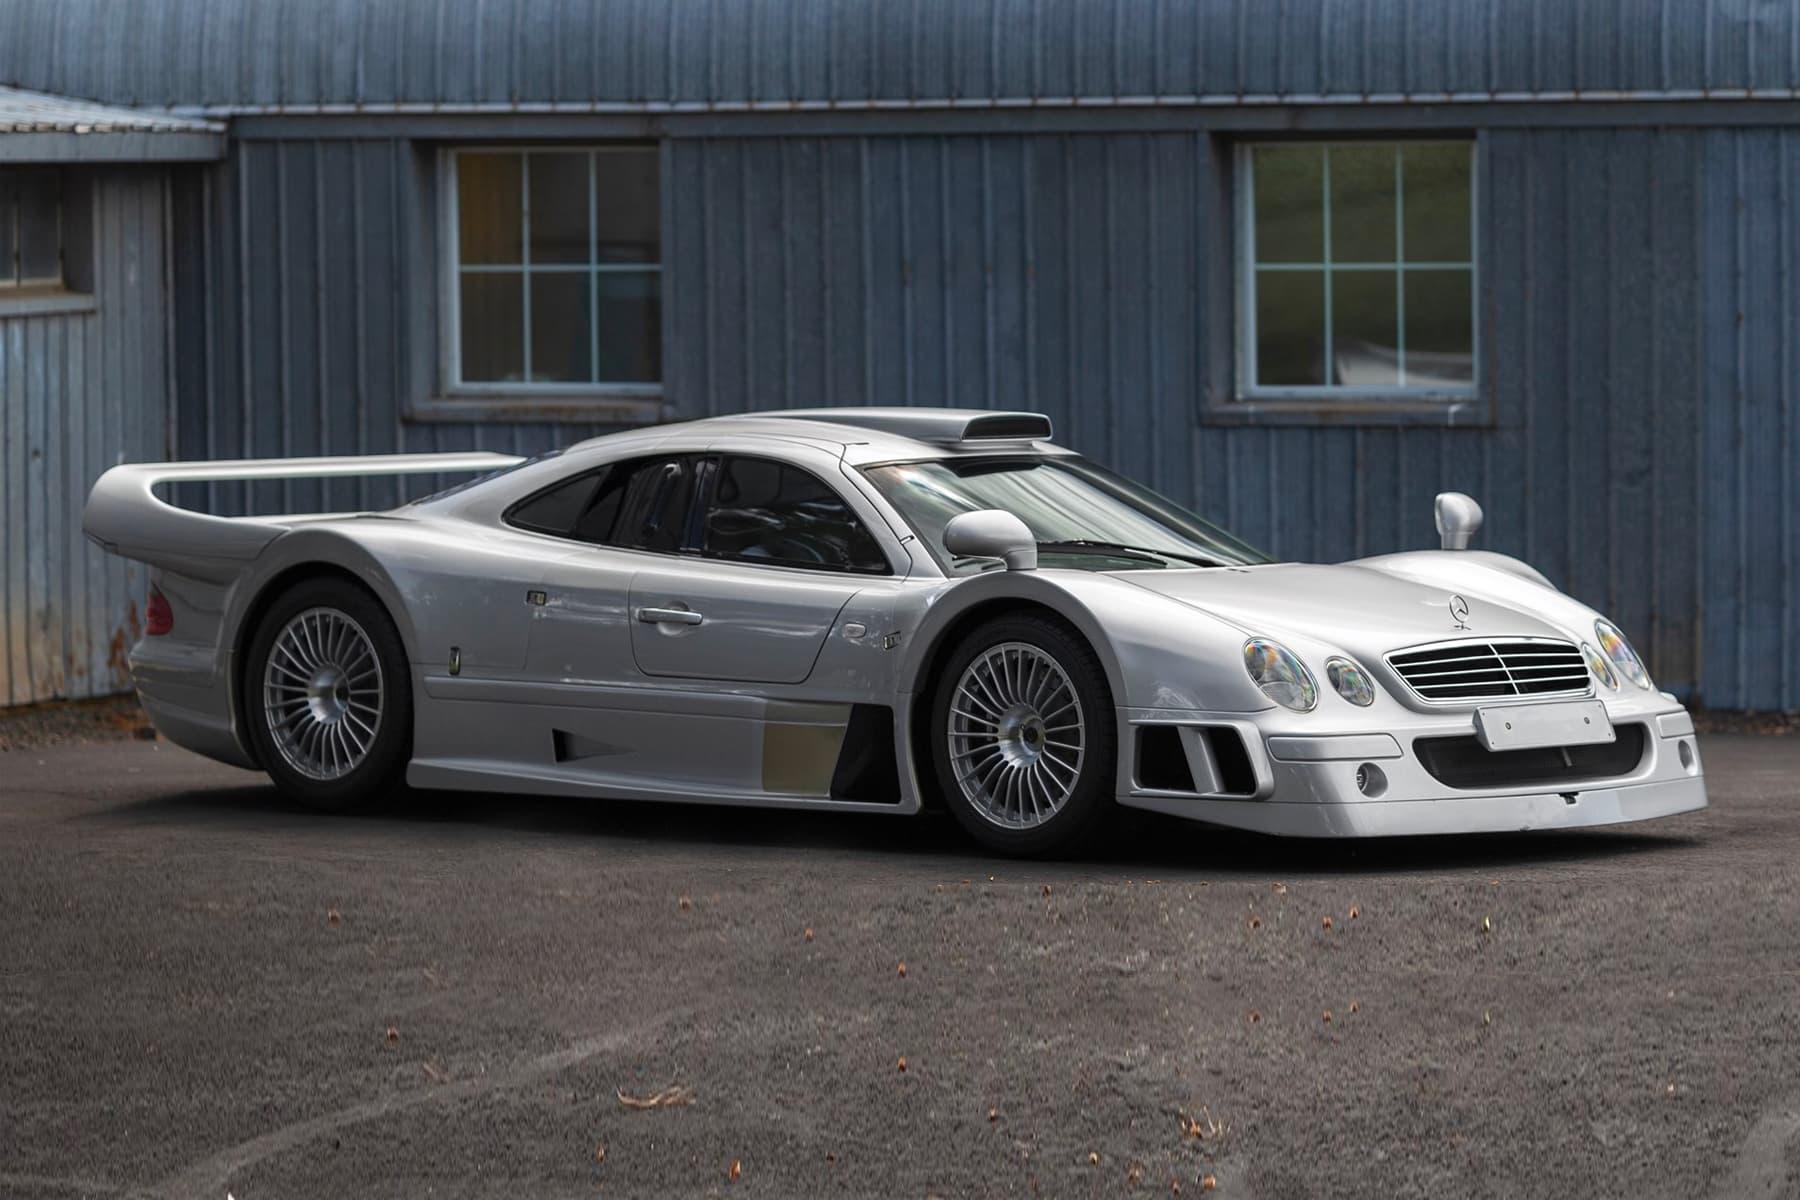 1998 Mercedes Benz Amg Clk Gtr Going For Auction Hypebeast